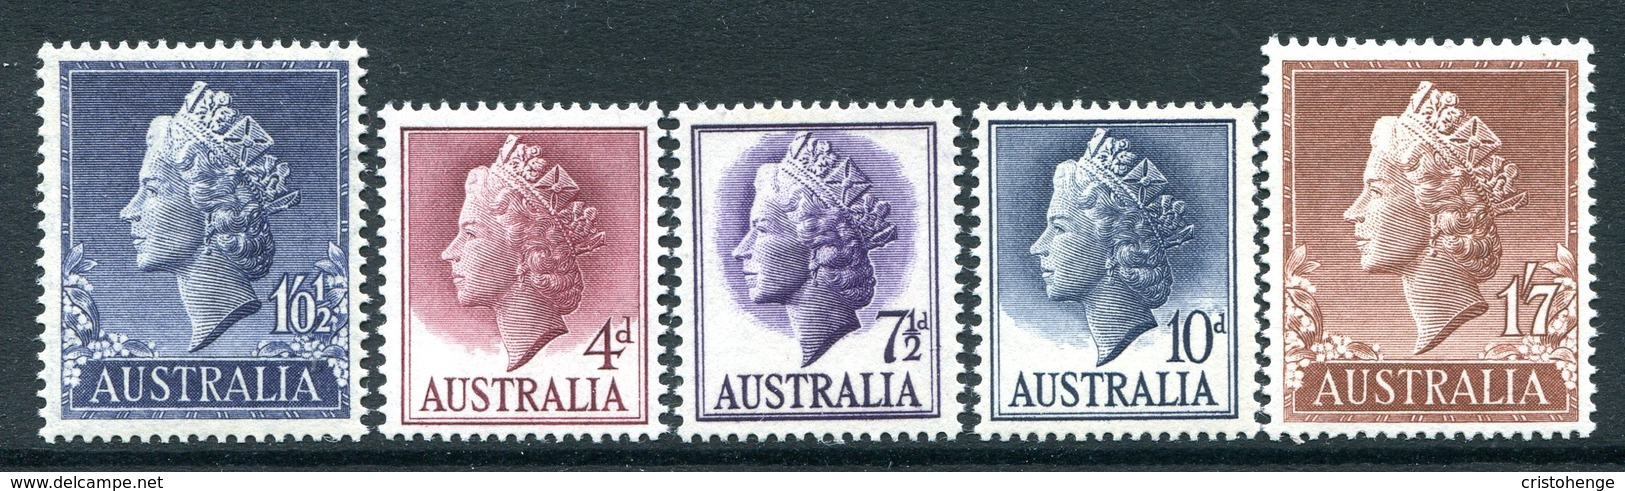 Australia 1955-57 QEII Definitives Set MNH (SG 282-282d) - Mint Stamps